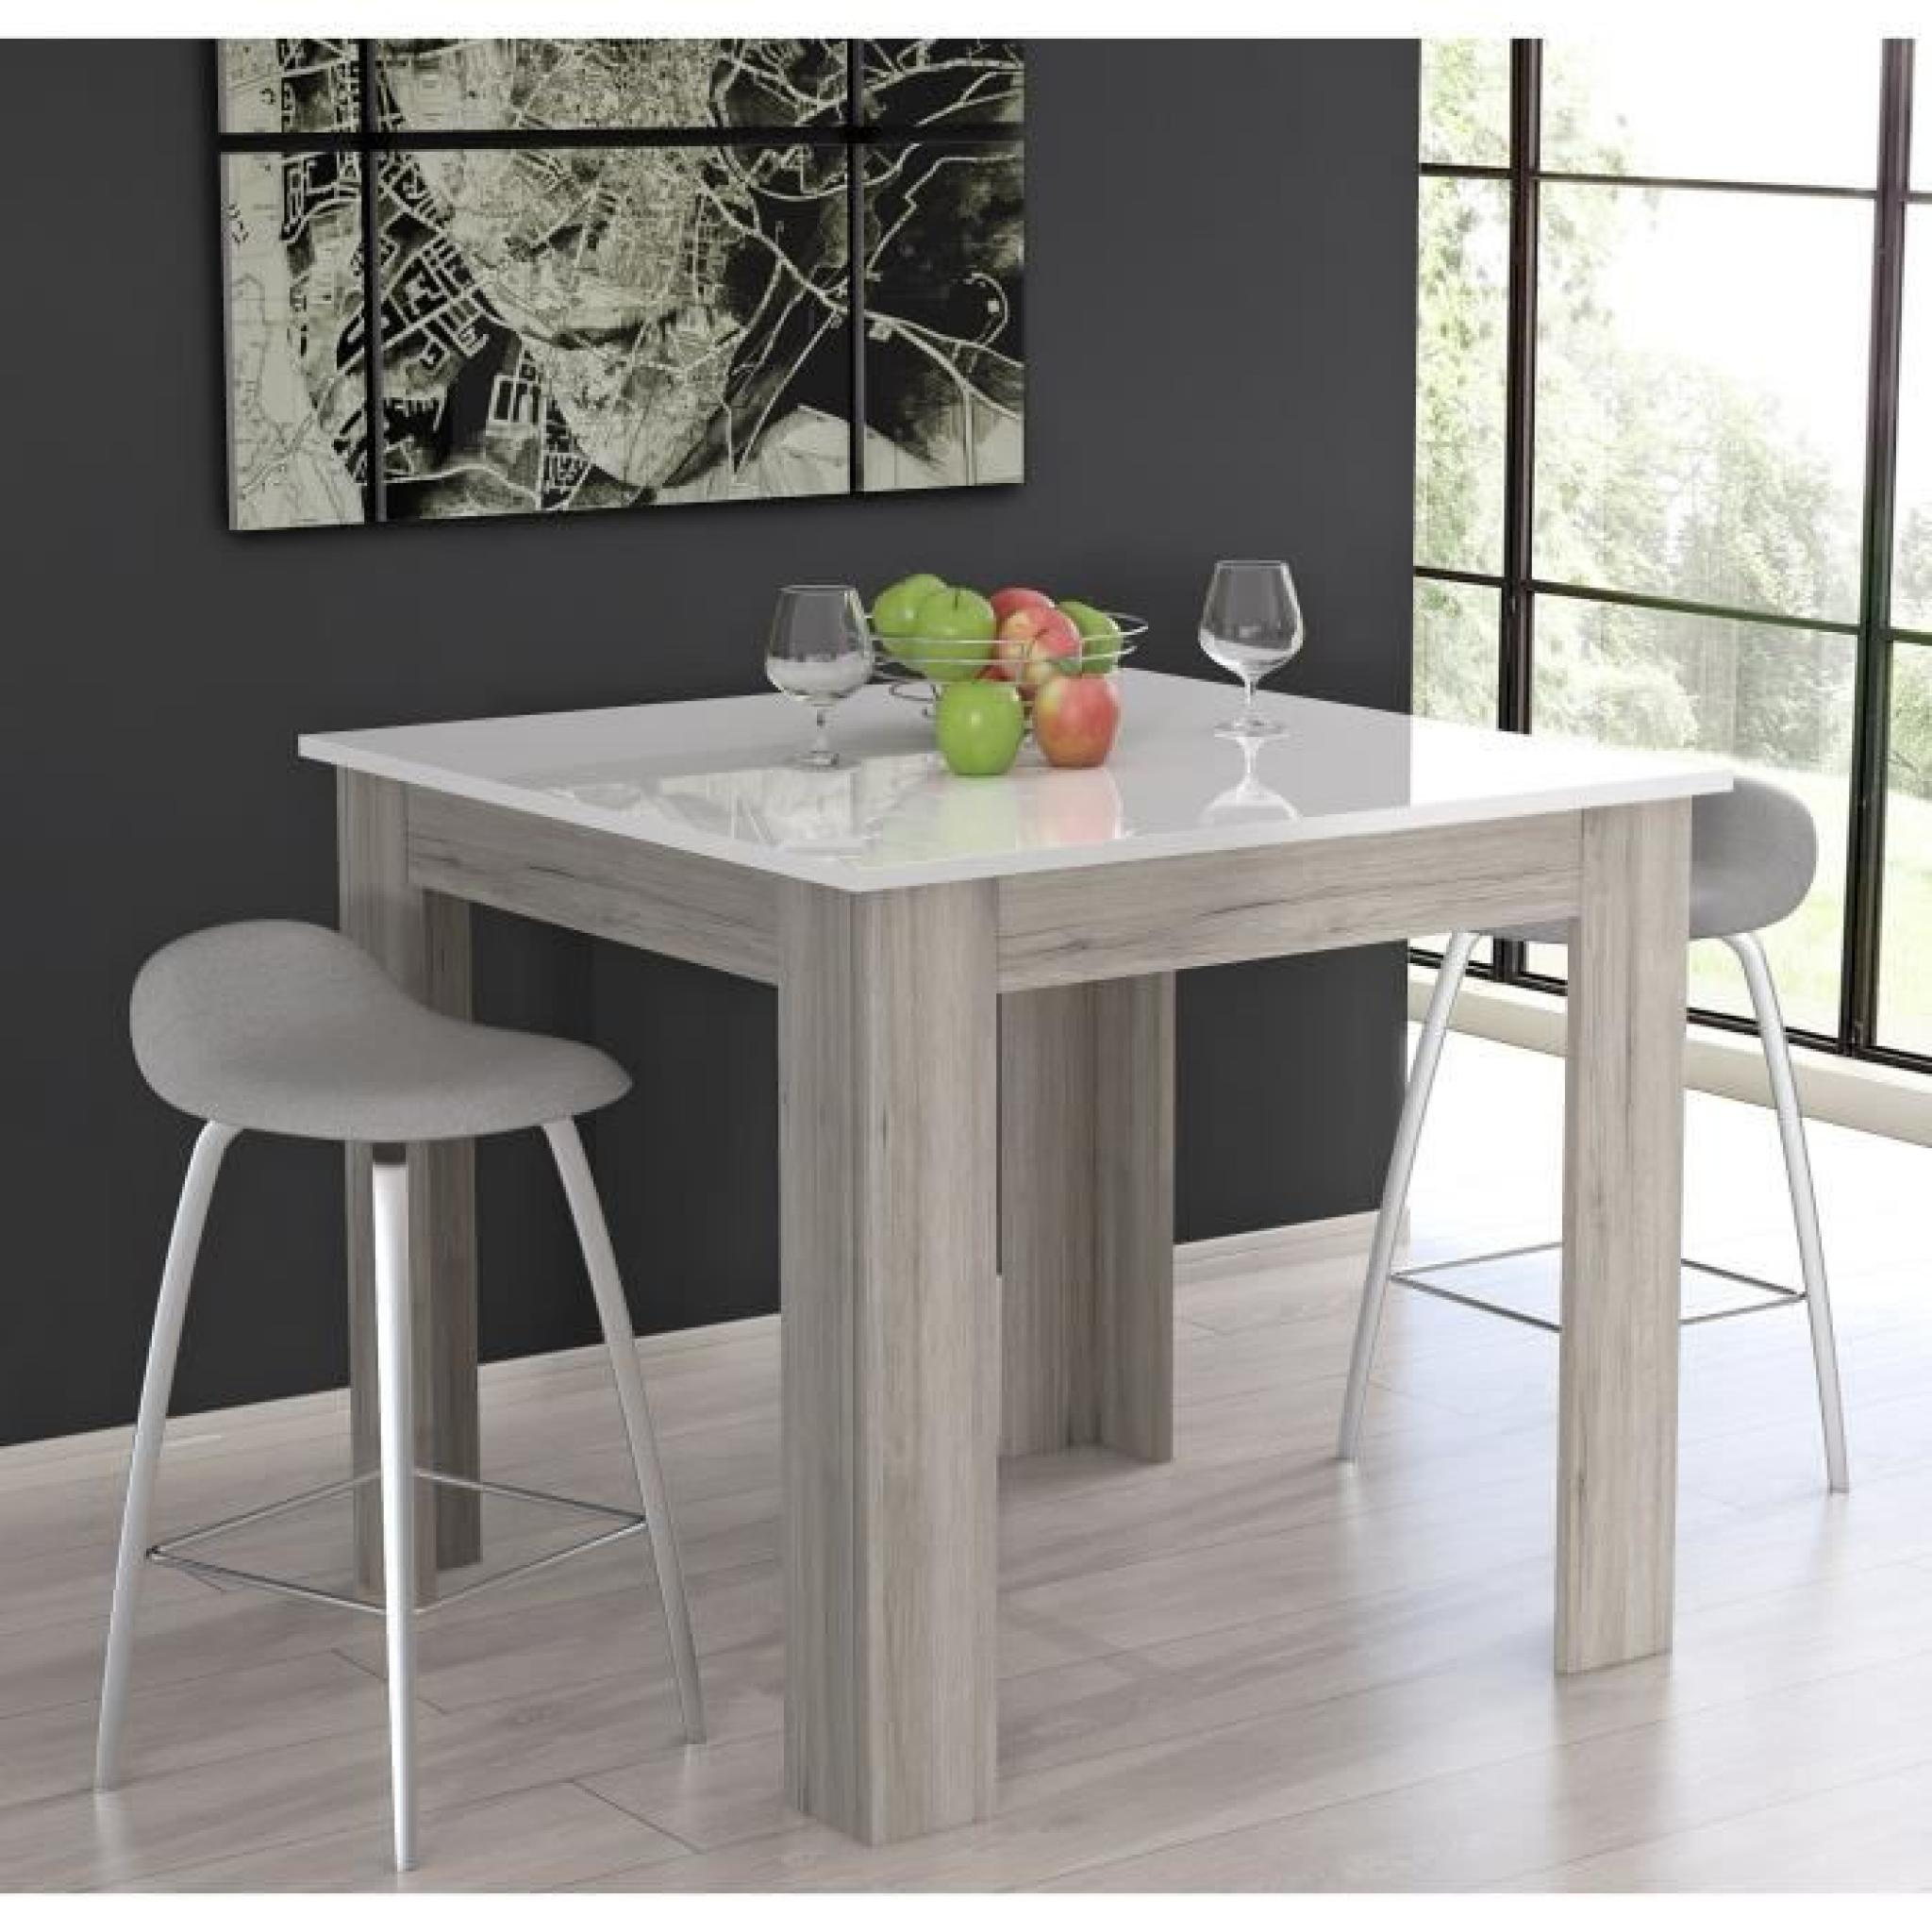 finlandek table de bar tietti 110x110cm laqu blanc brillant et d cor ch ne cendr achat. Black Bedroom Furniture Sets. Home Design Ideas